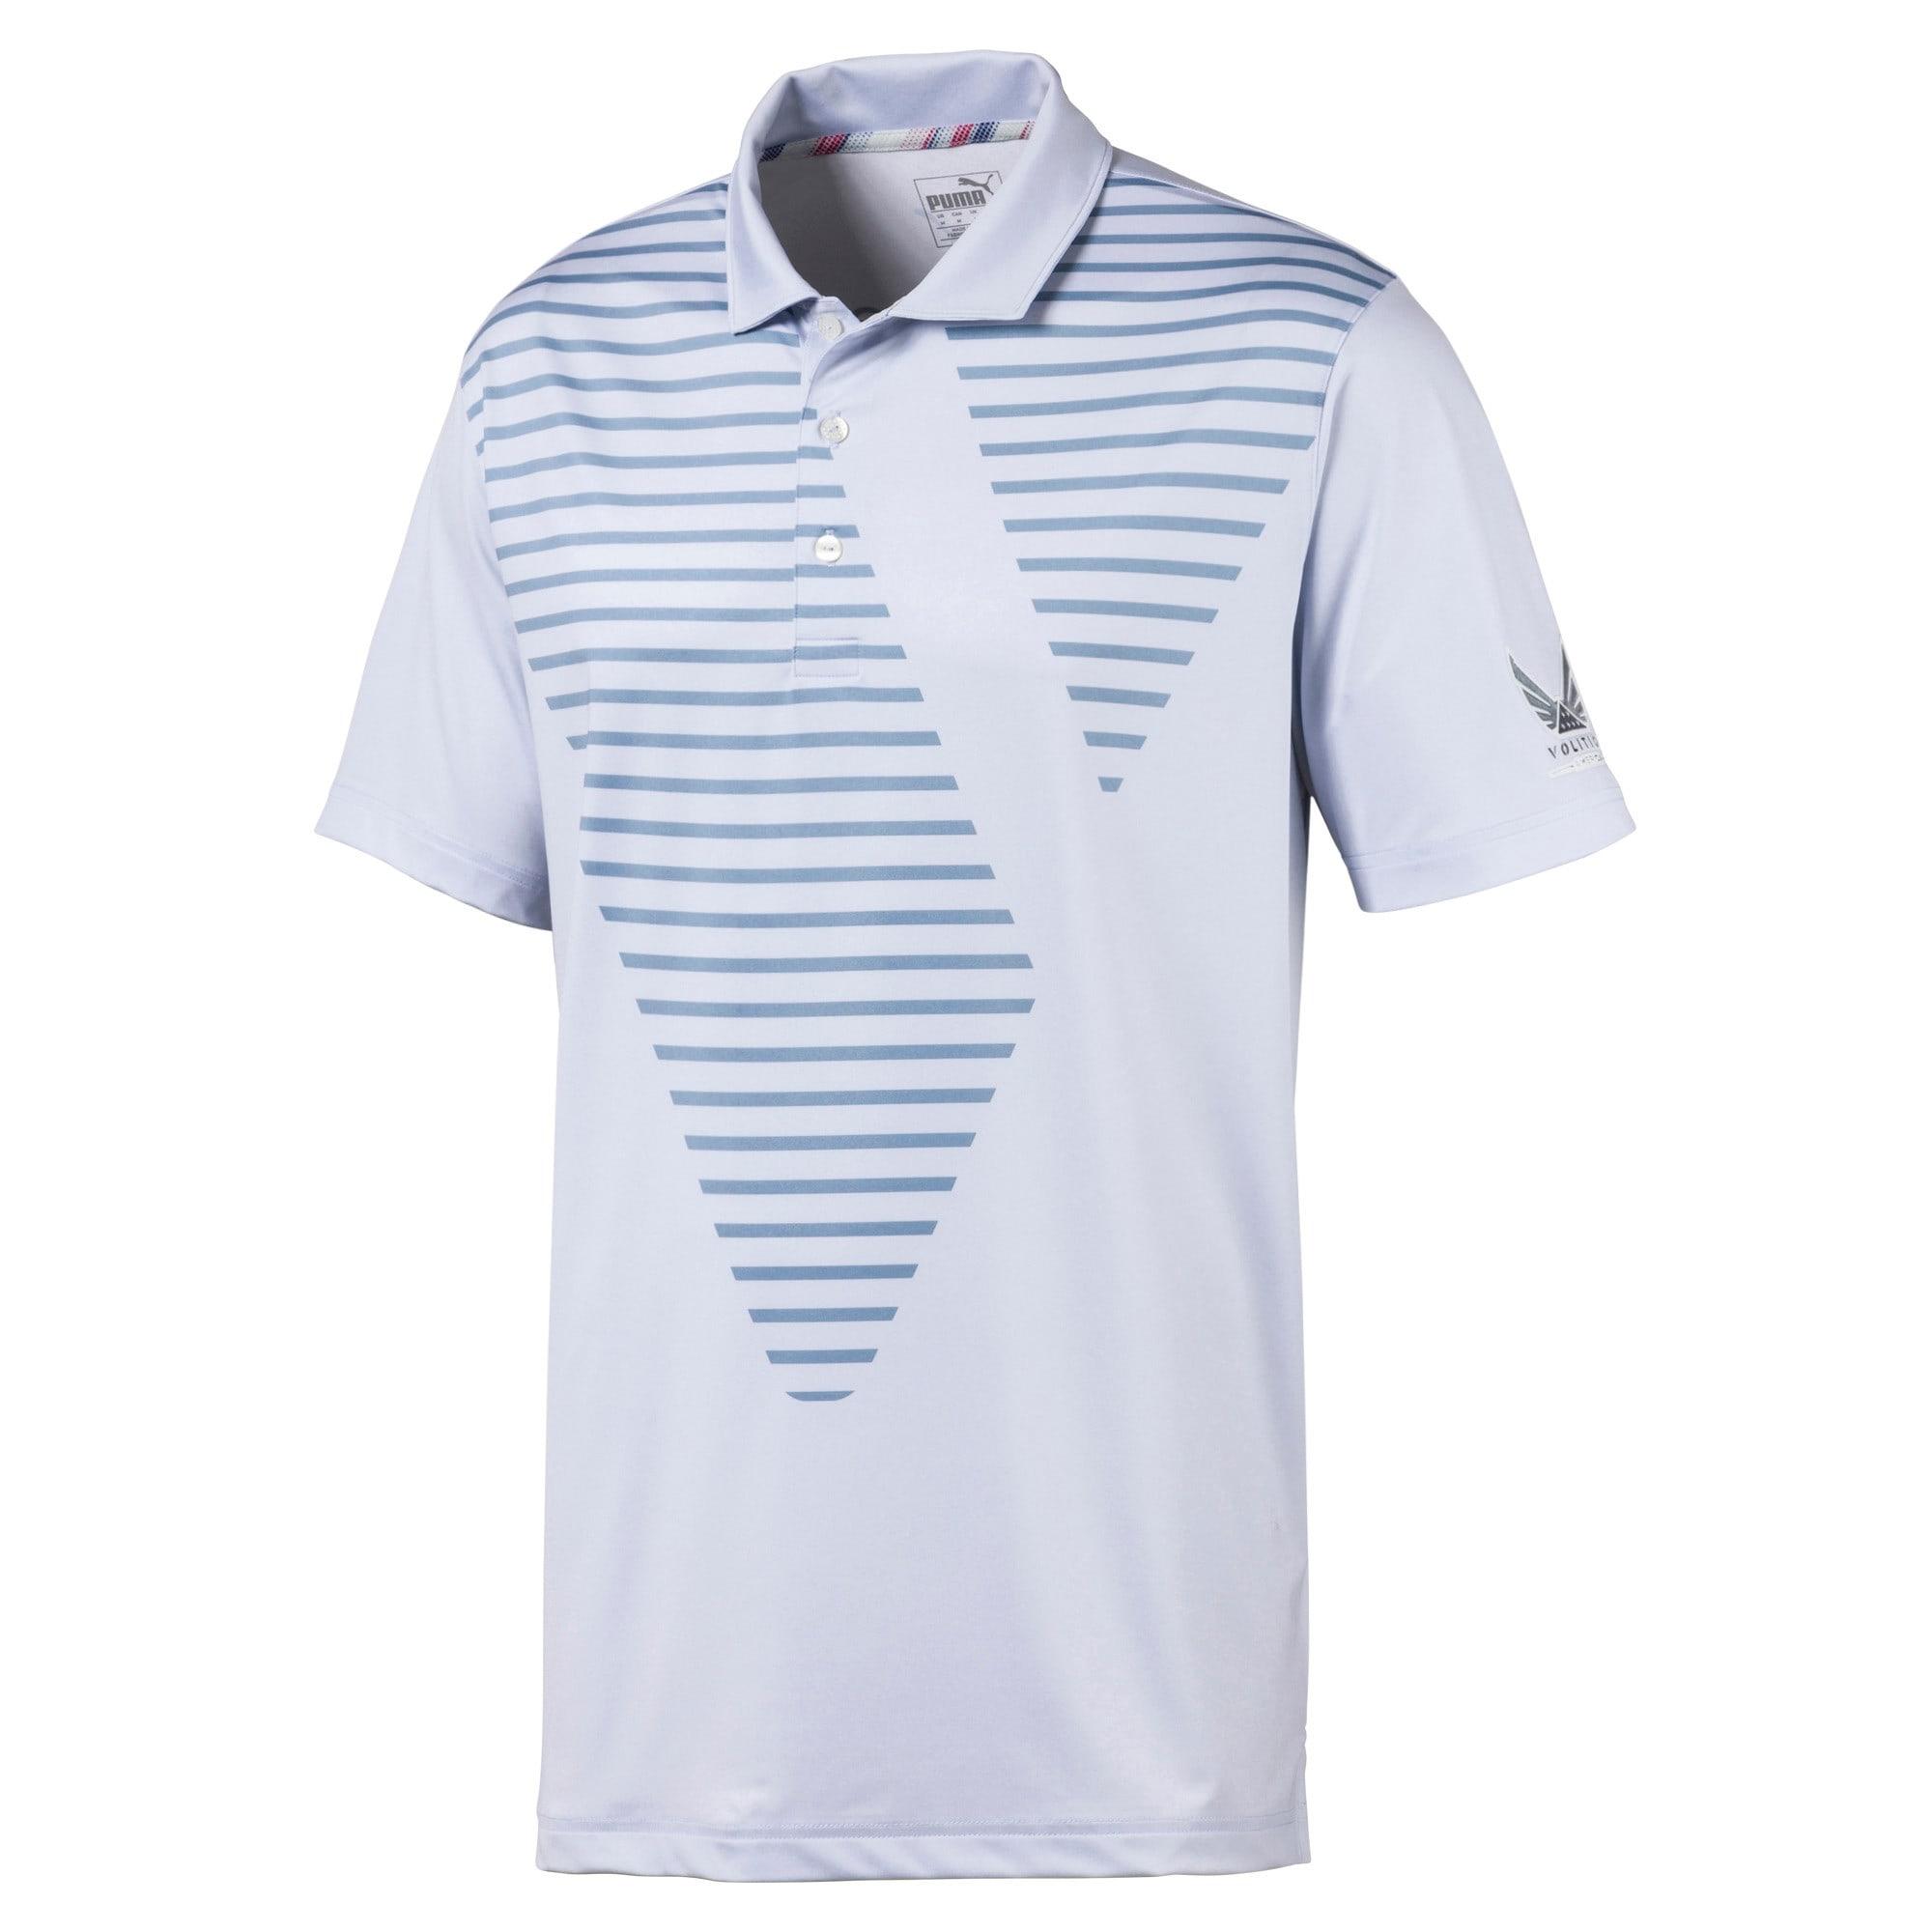 Miniatura 1 de Camiseta tipo polo Volition Sky para hombre, Heather, mediano